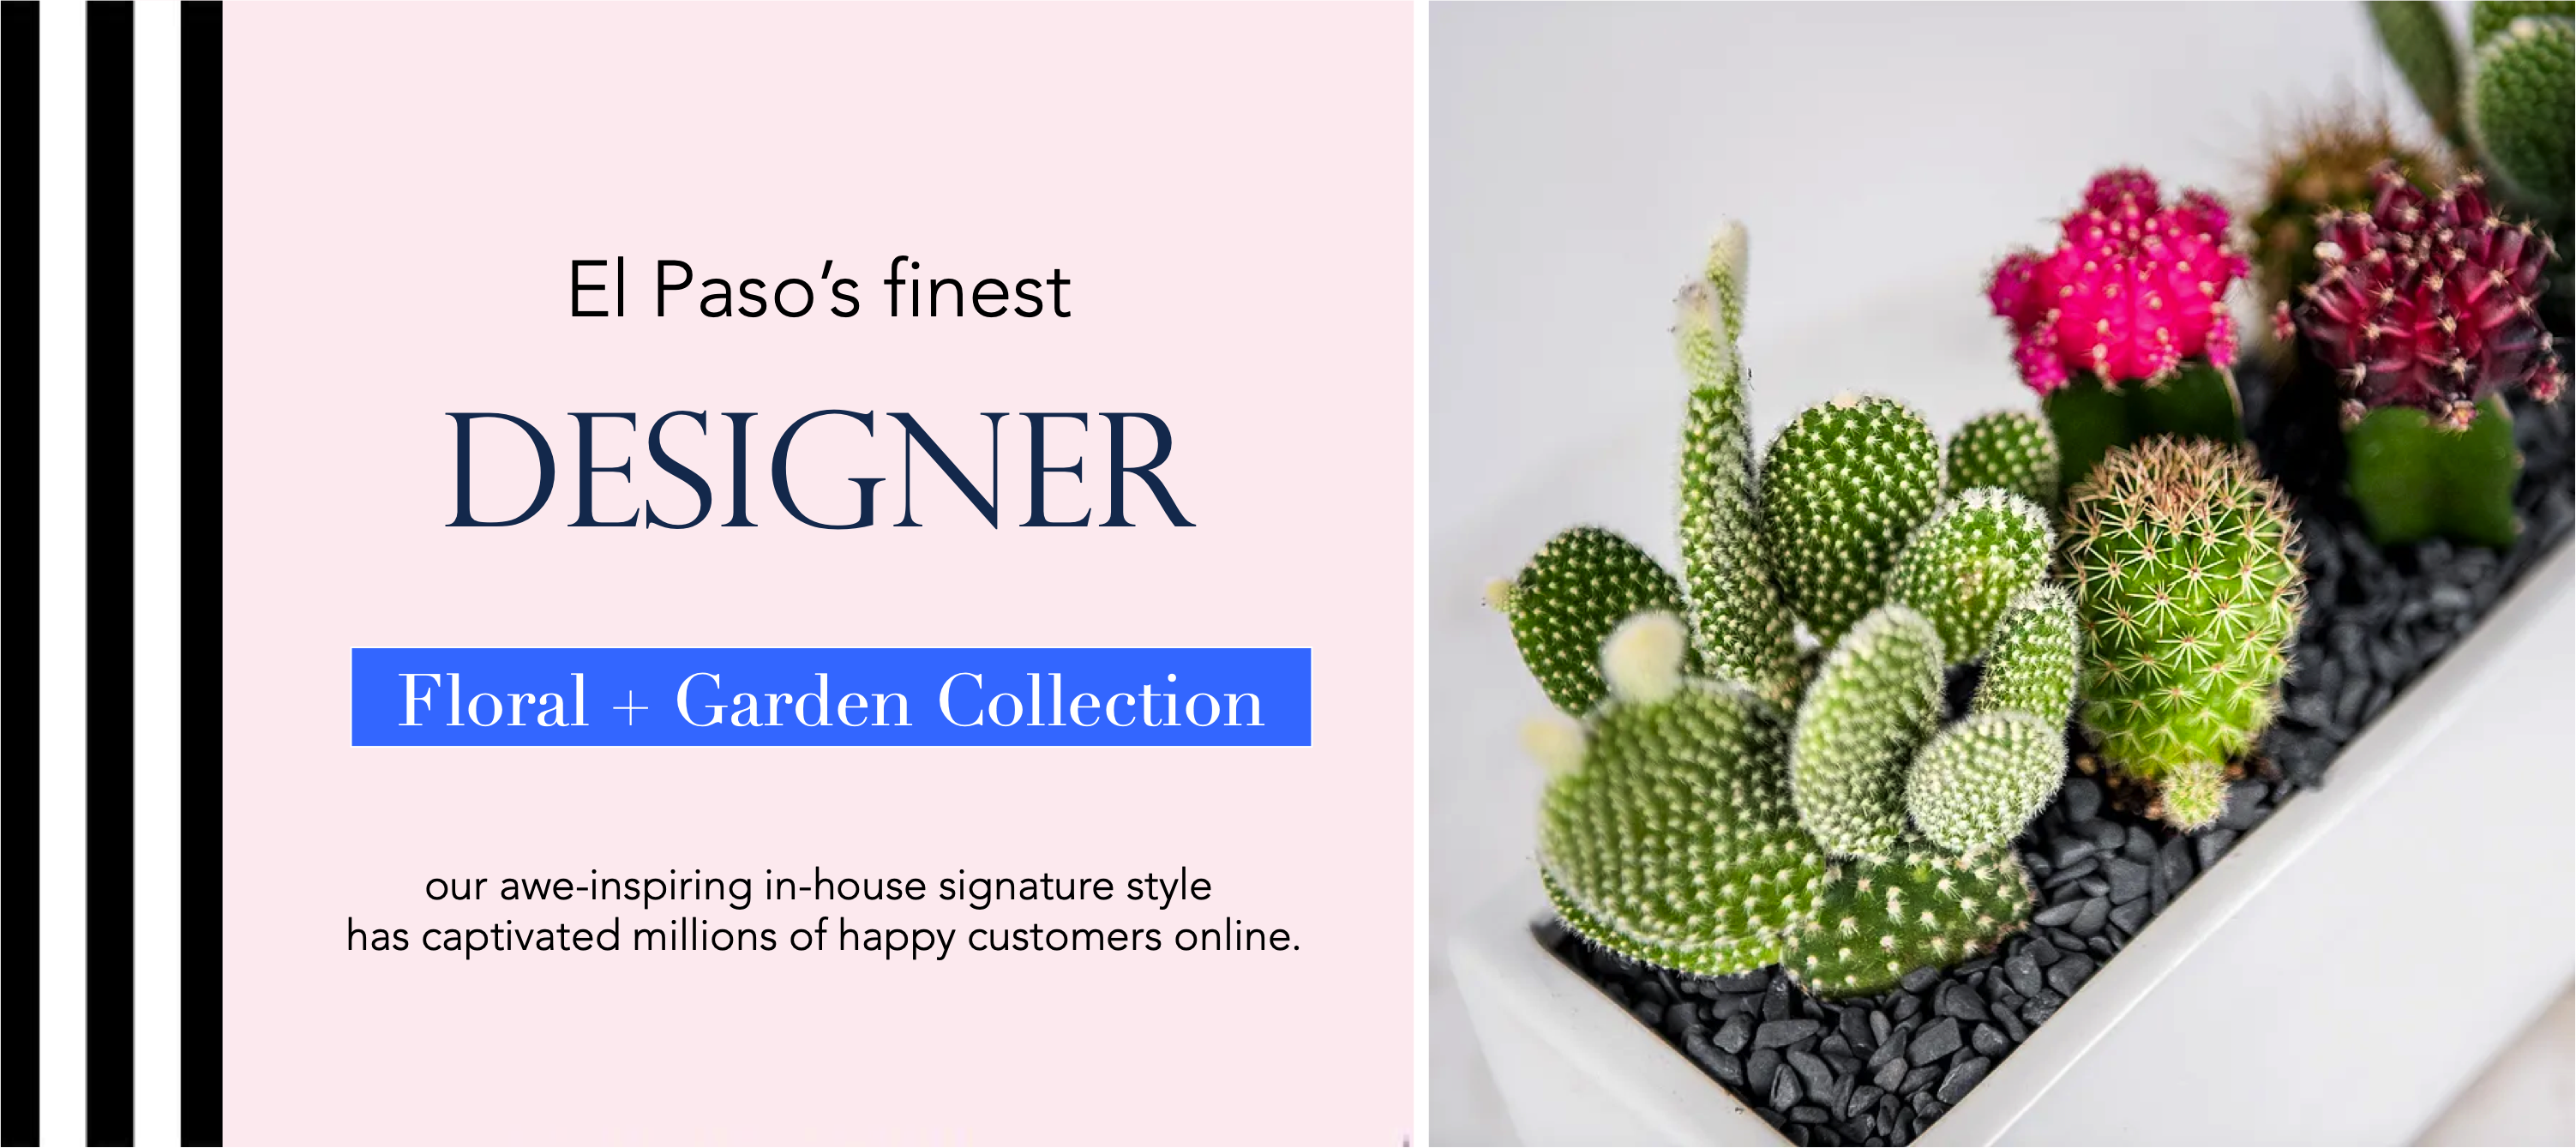 0-79912-angies-floral-designs-plants-0-1-bridal-el-paso-florist-79912-flowershop-flower-delivery-el-paso-luxury-flowers-angies-floral-el-paso-florist-79912-.png